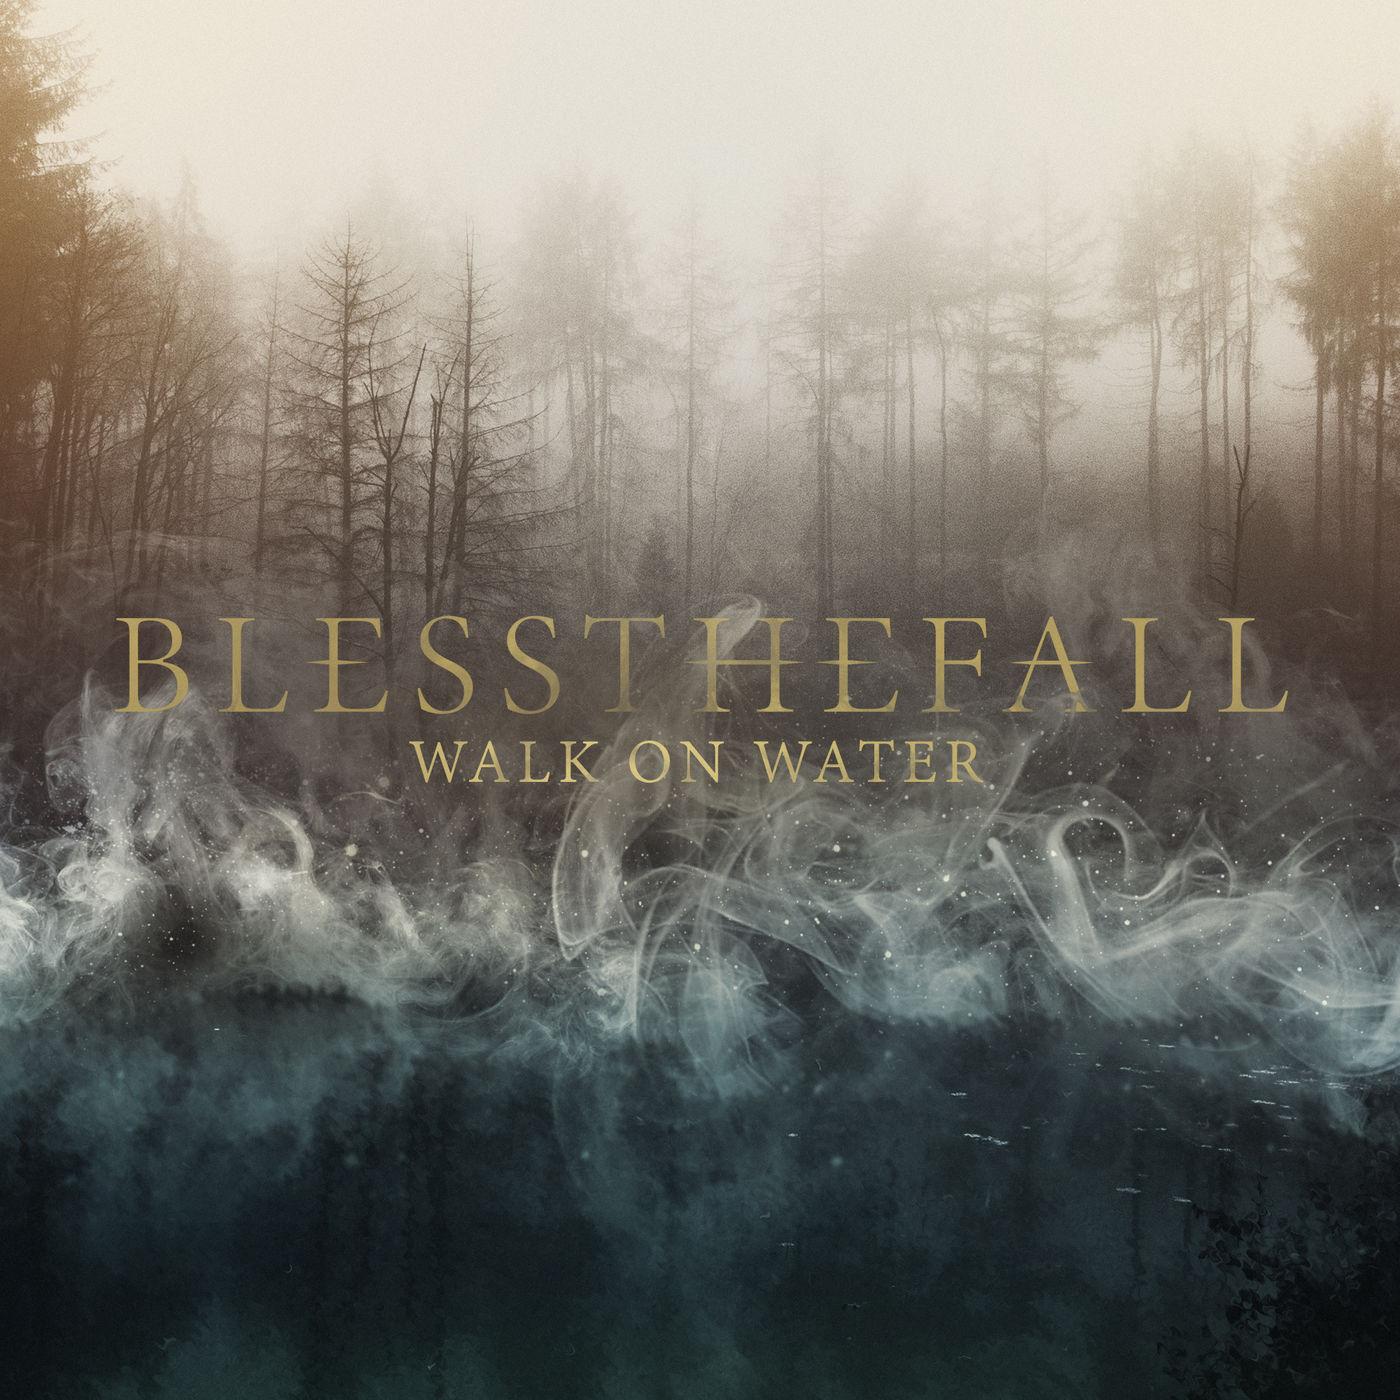 Blessthefall – Walk on Water [Single] (2015)